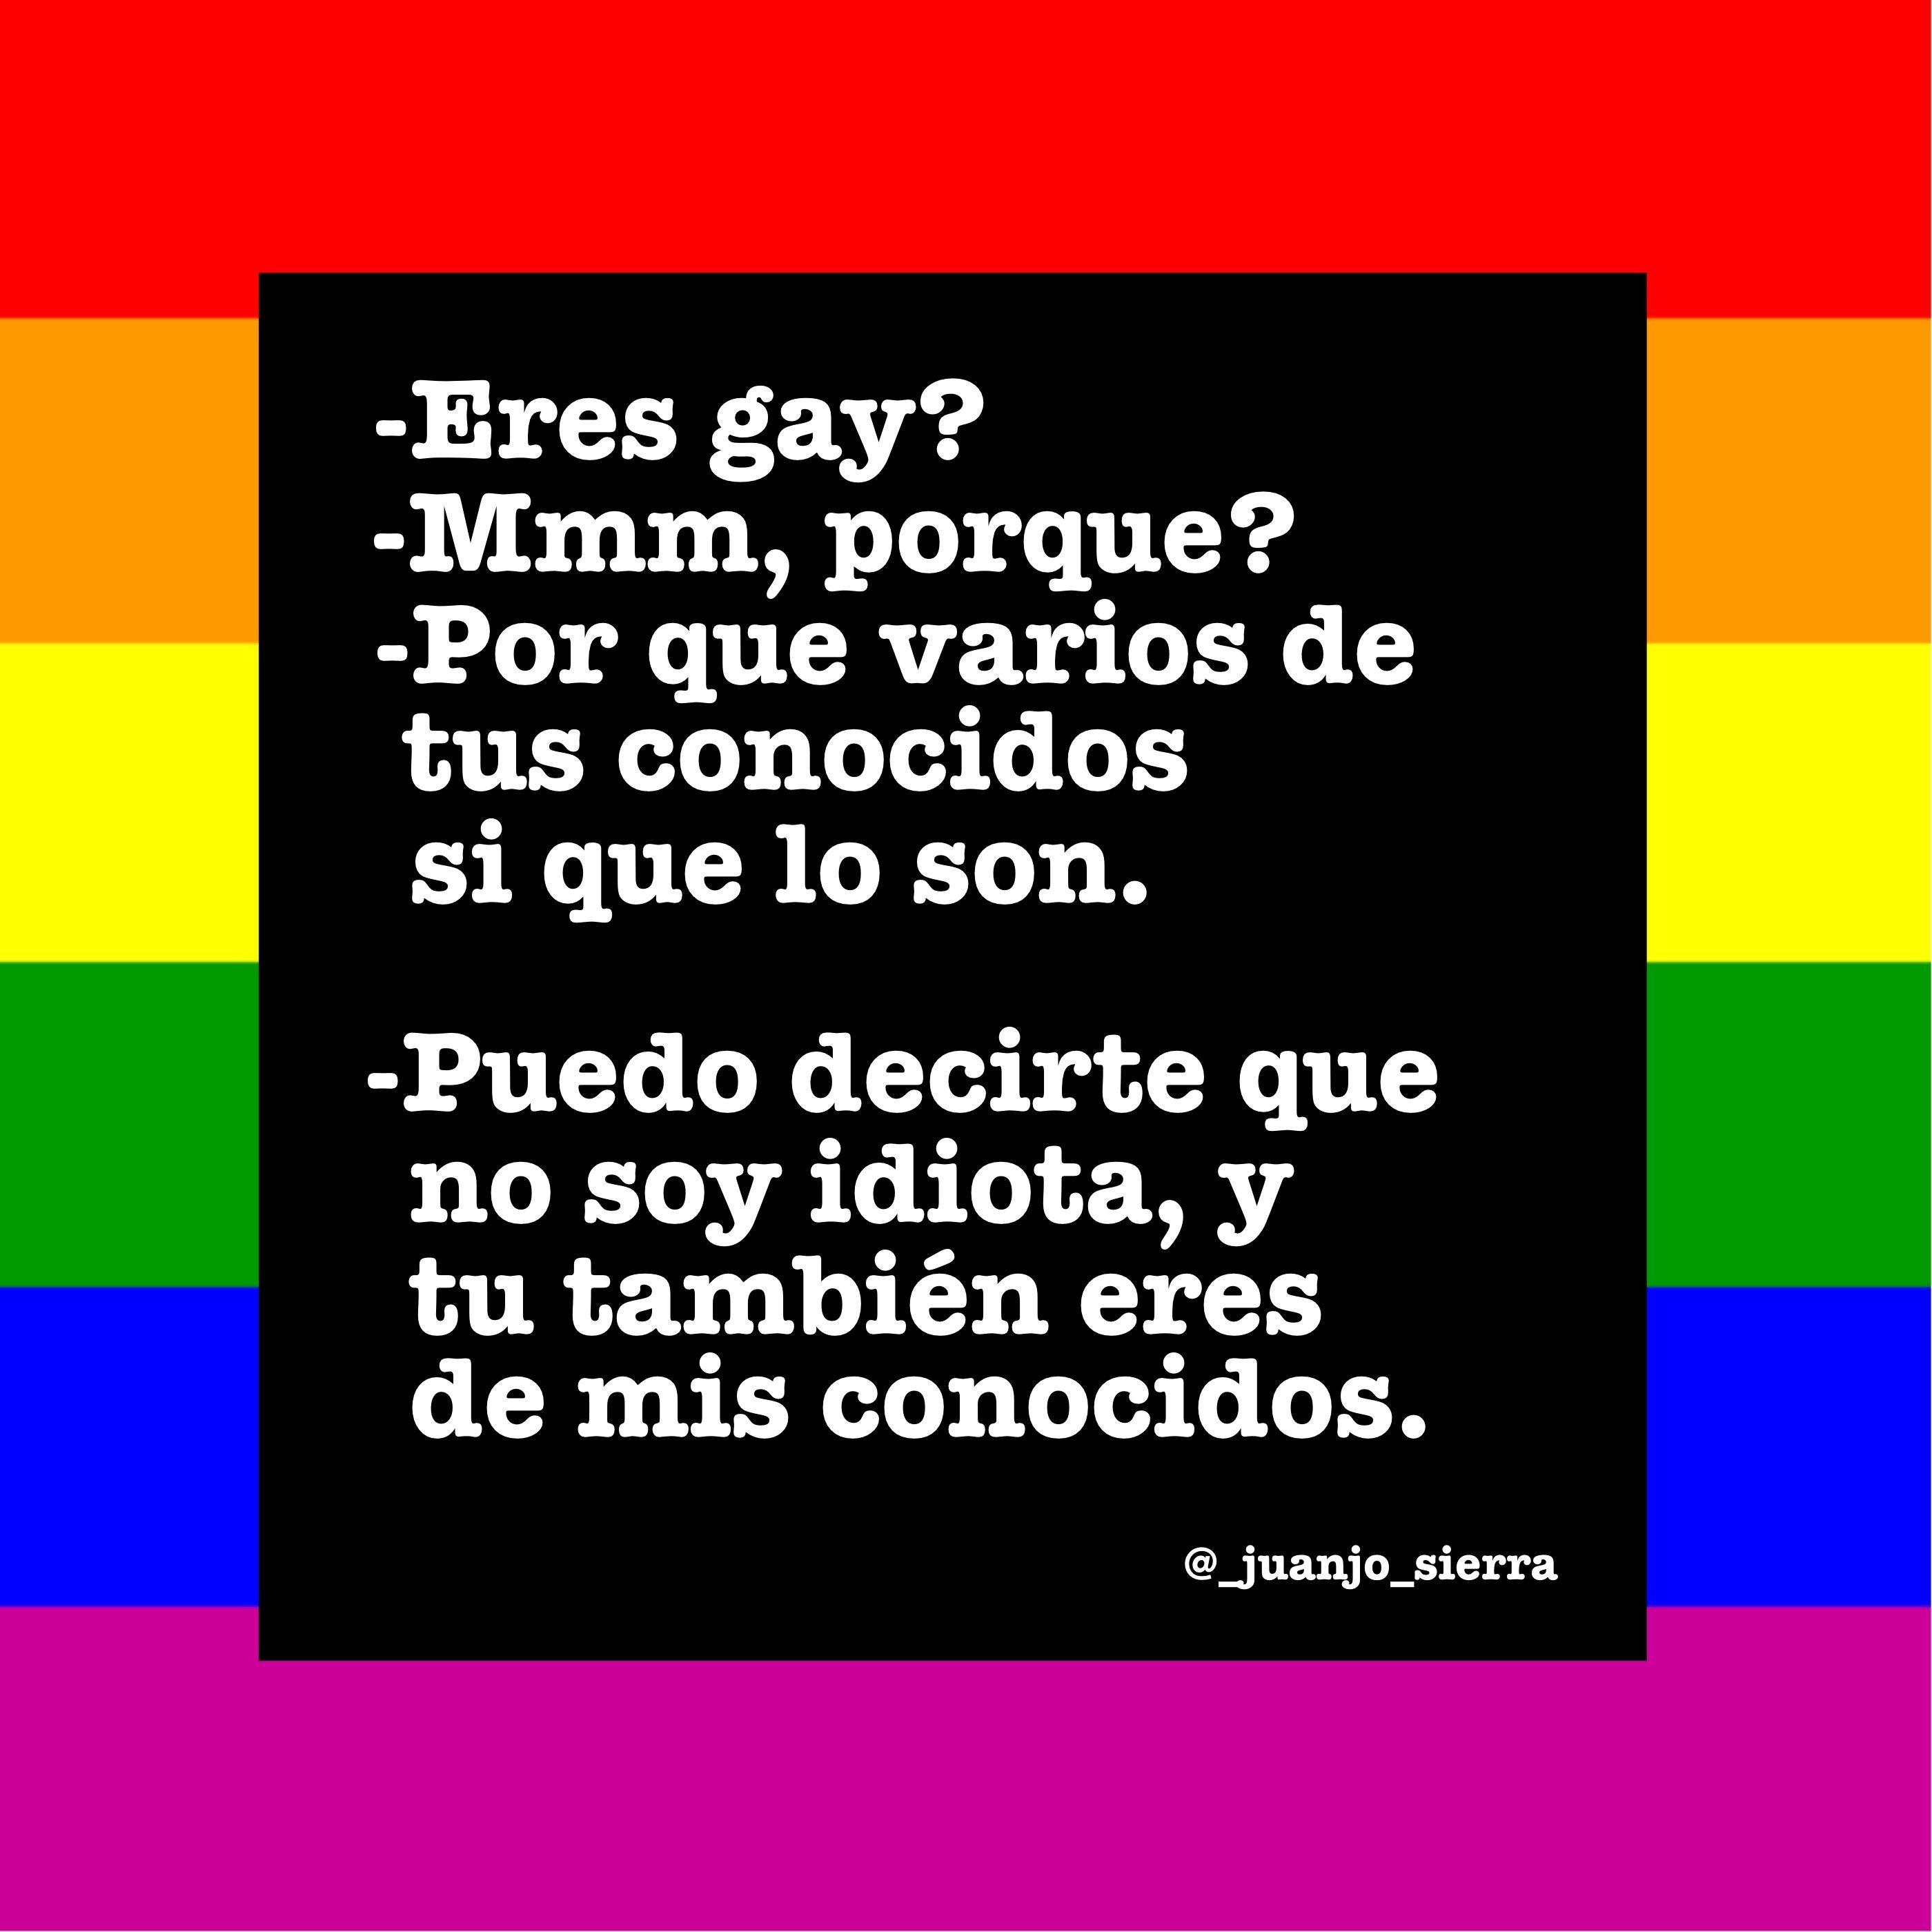 que eres gay en ingles